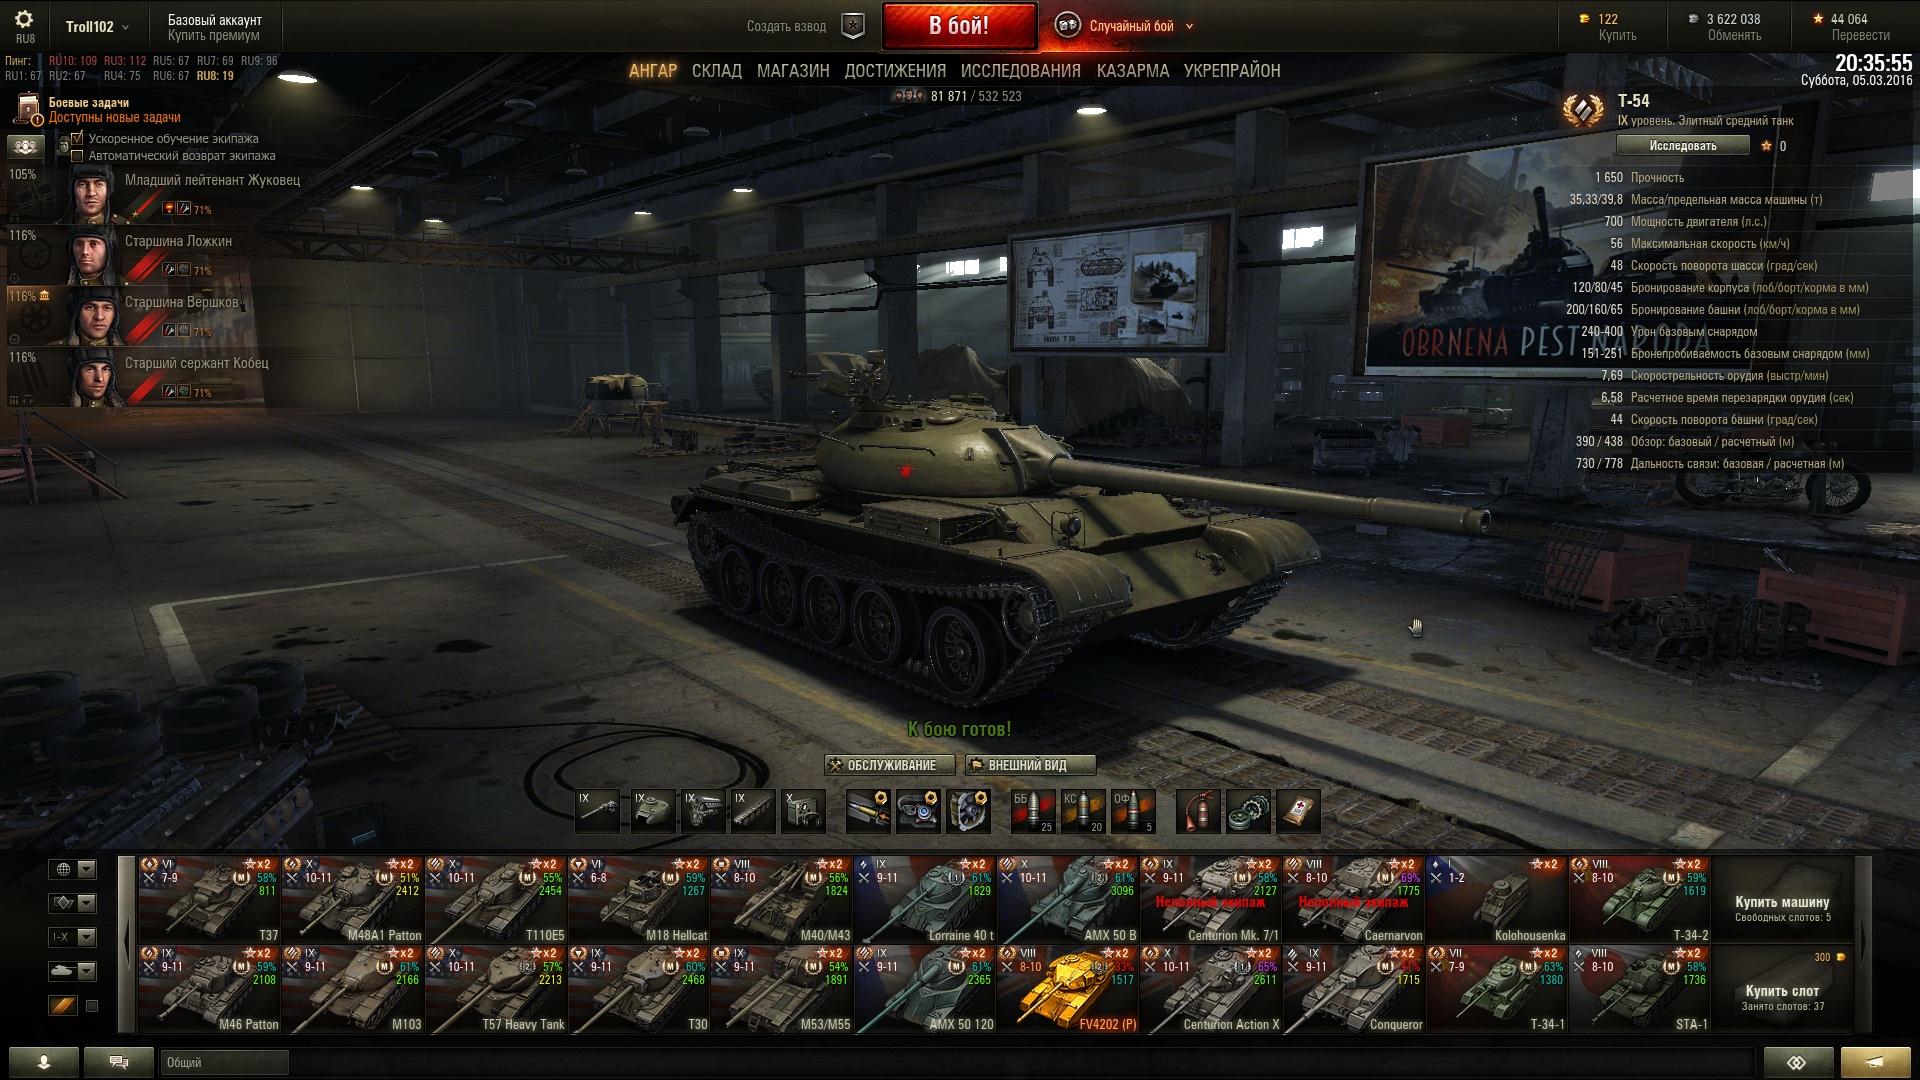 Type 59 будет в продажи на 9 мая 2016 wot worldoftanks golds продажа